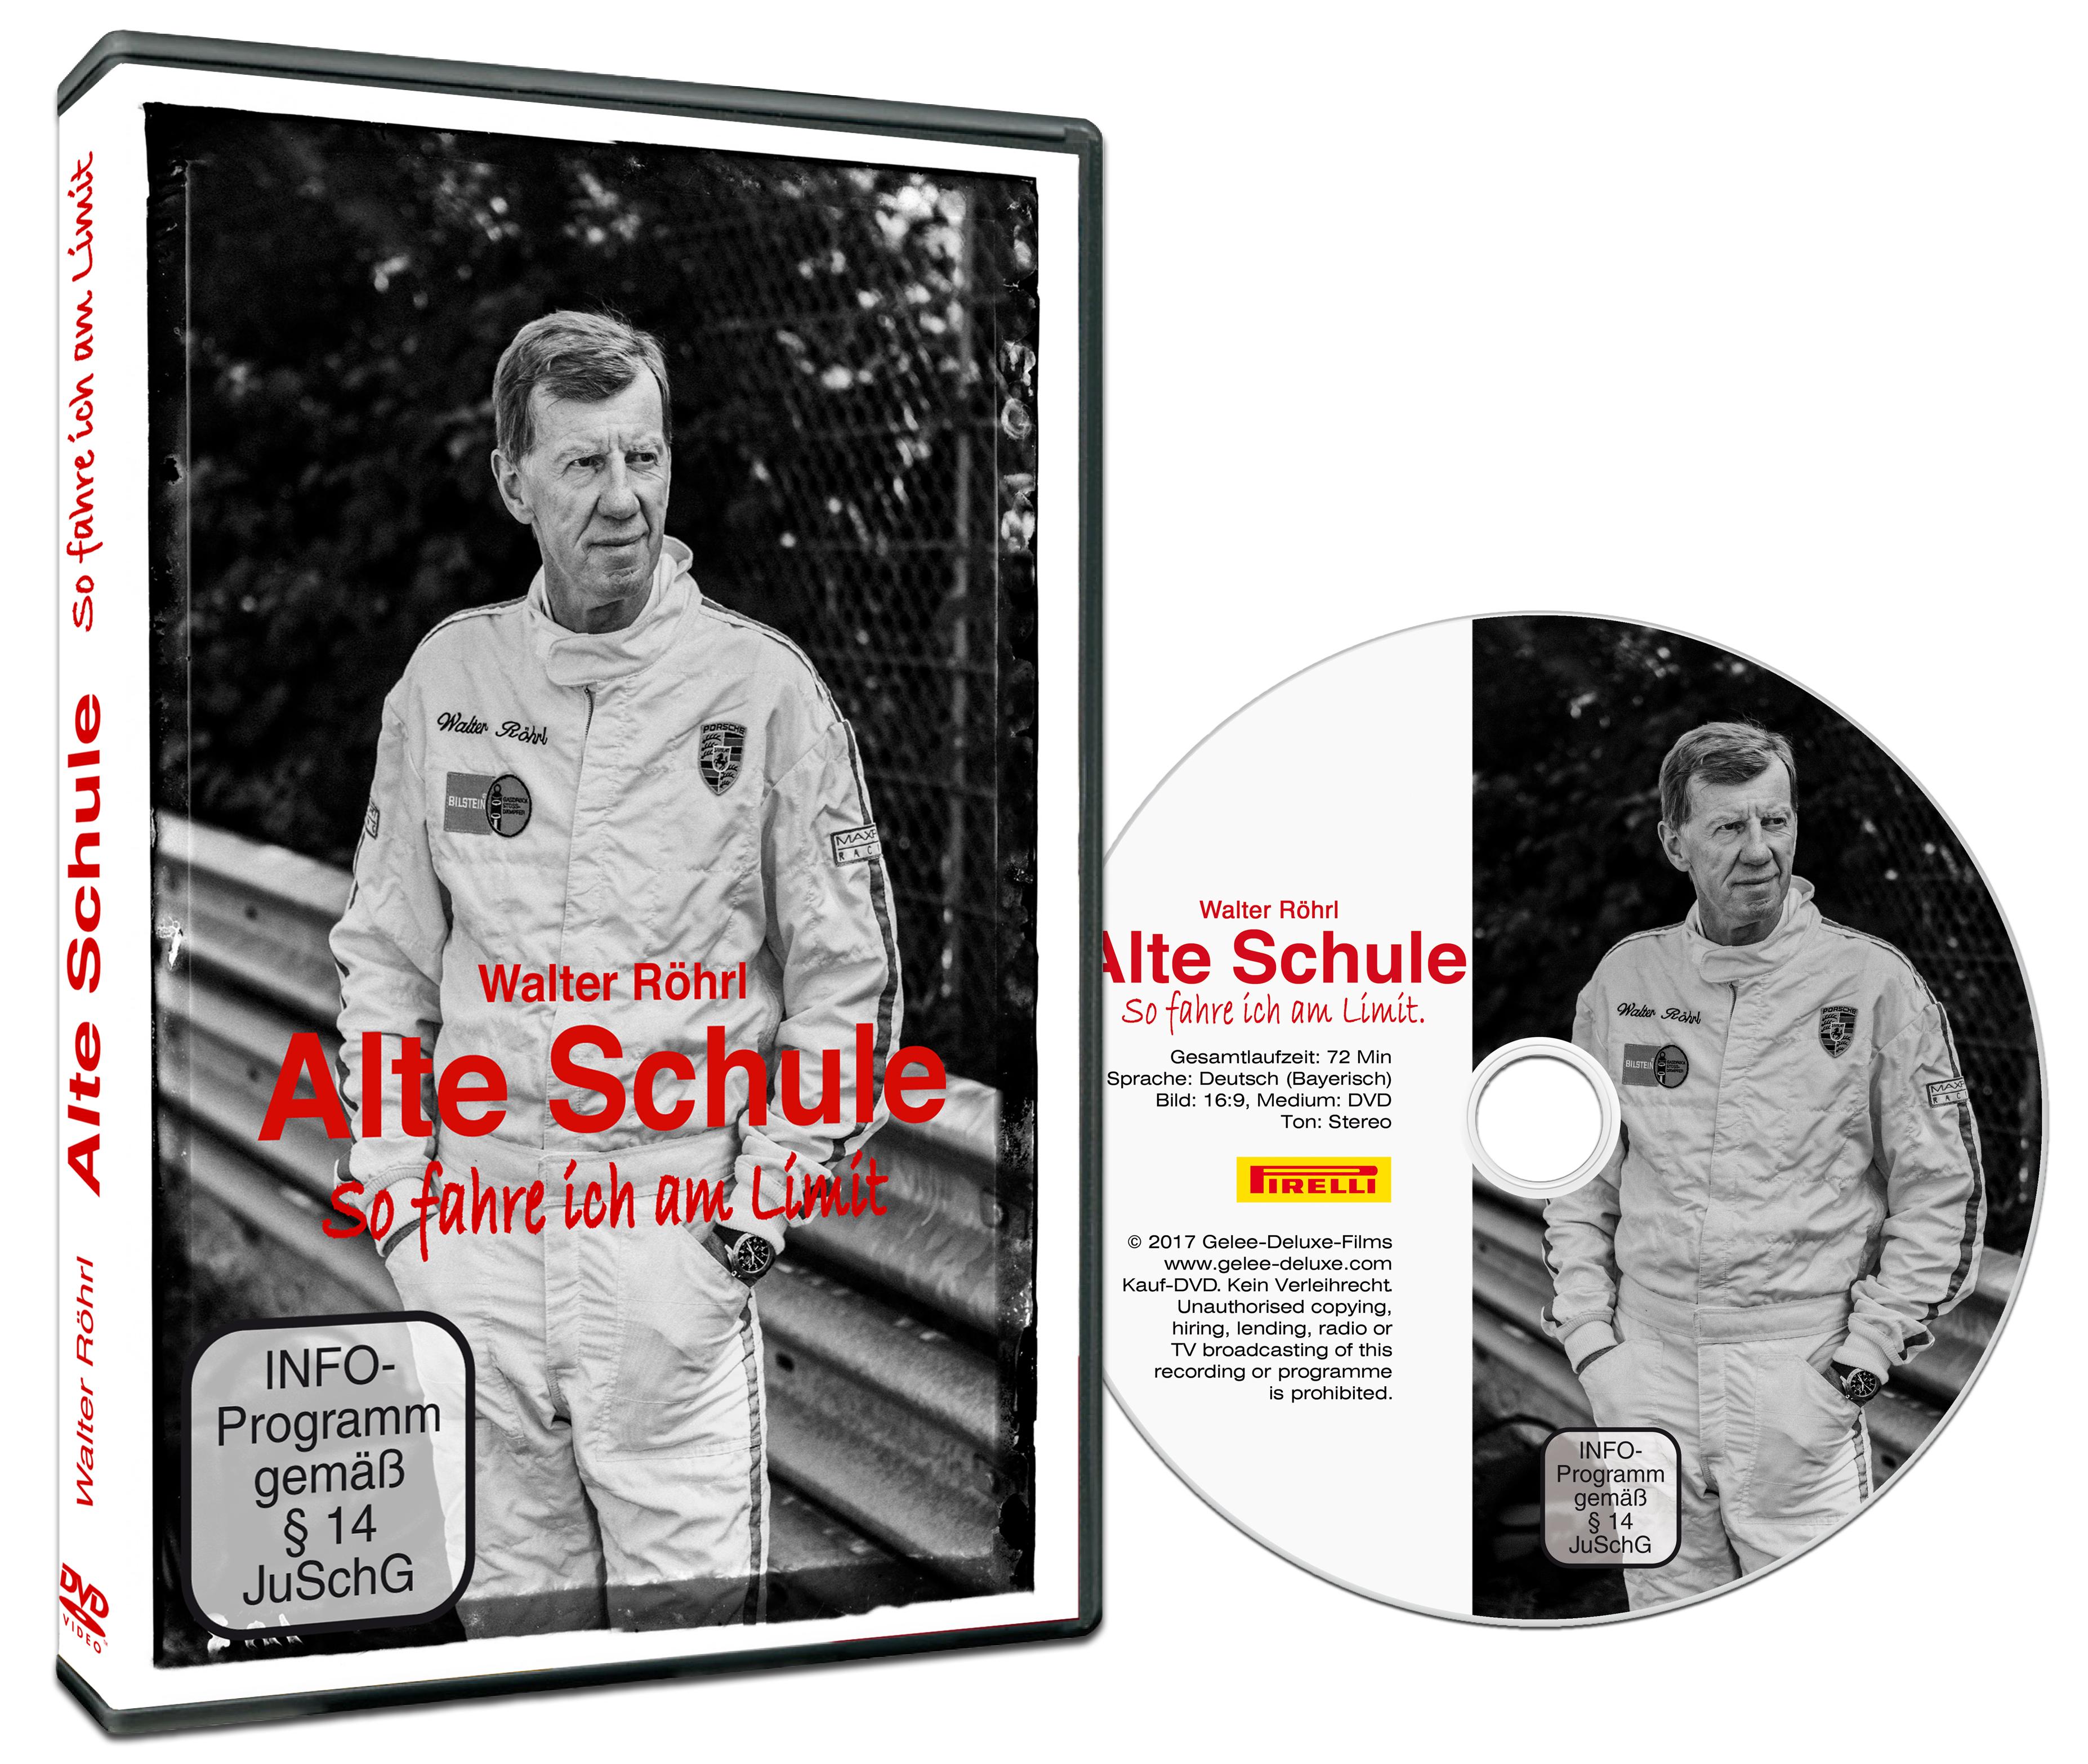 Walter Röhrl Collection DVD Alte Schule